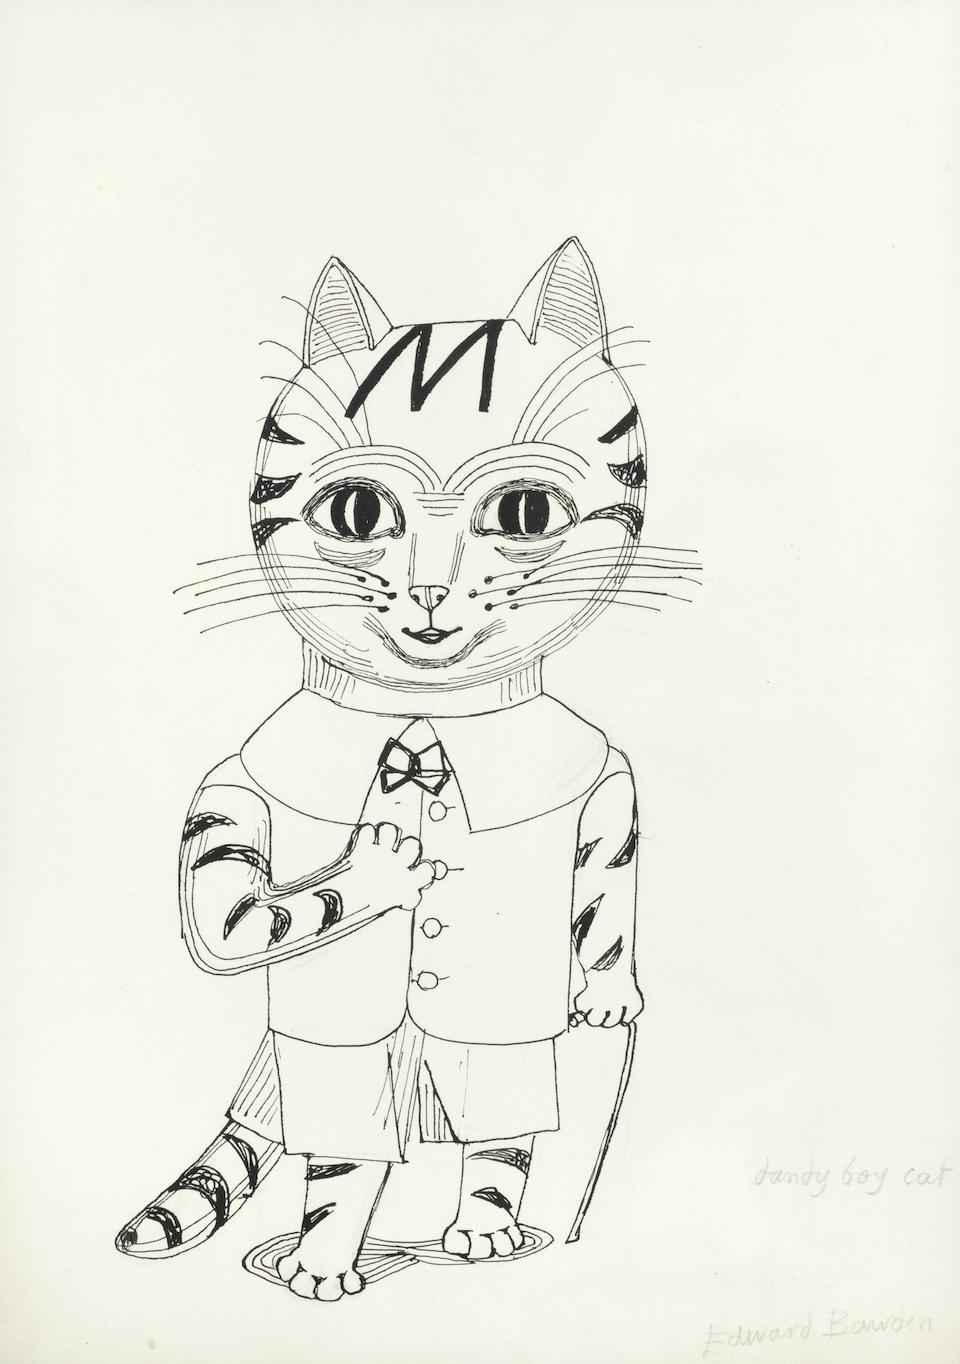 Edward Bawden drawing 'Dandy Boy Cat' pen and ink Modern British Art kitten